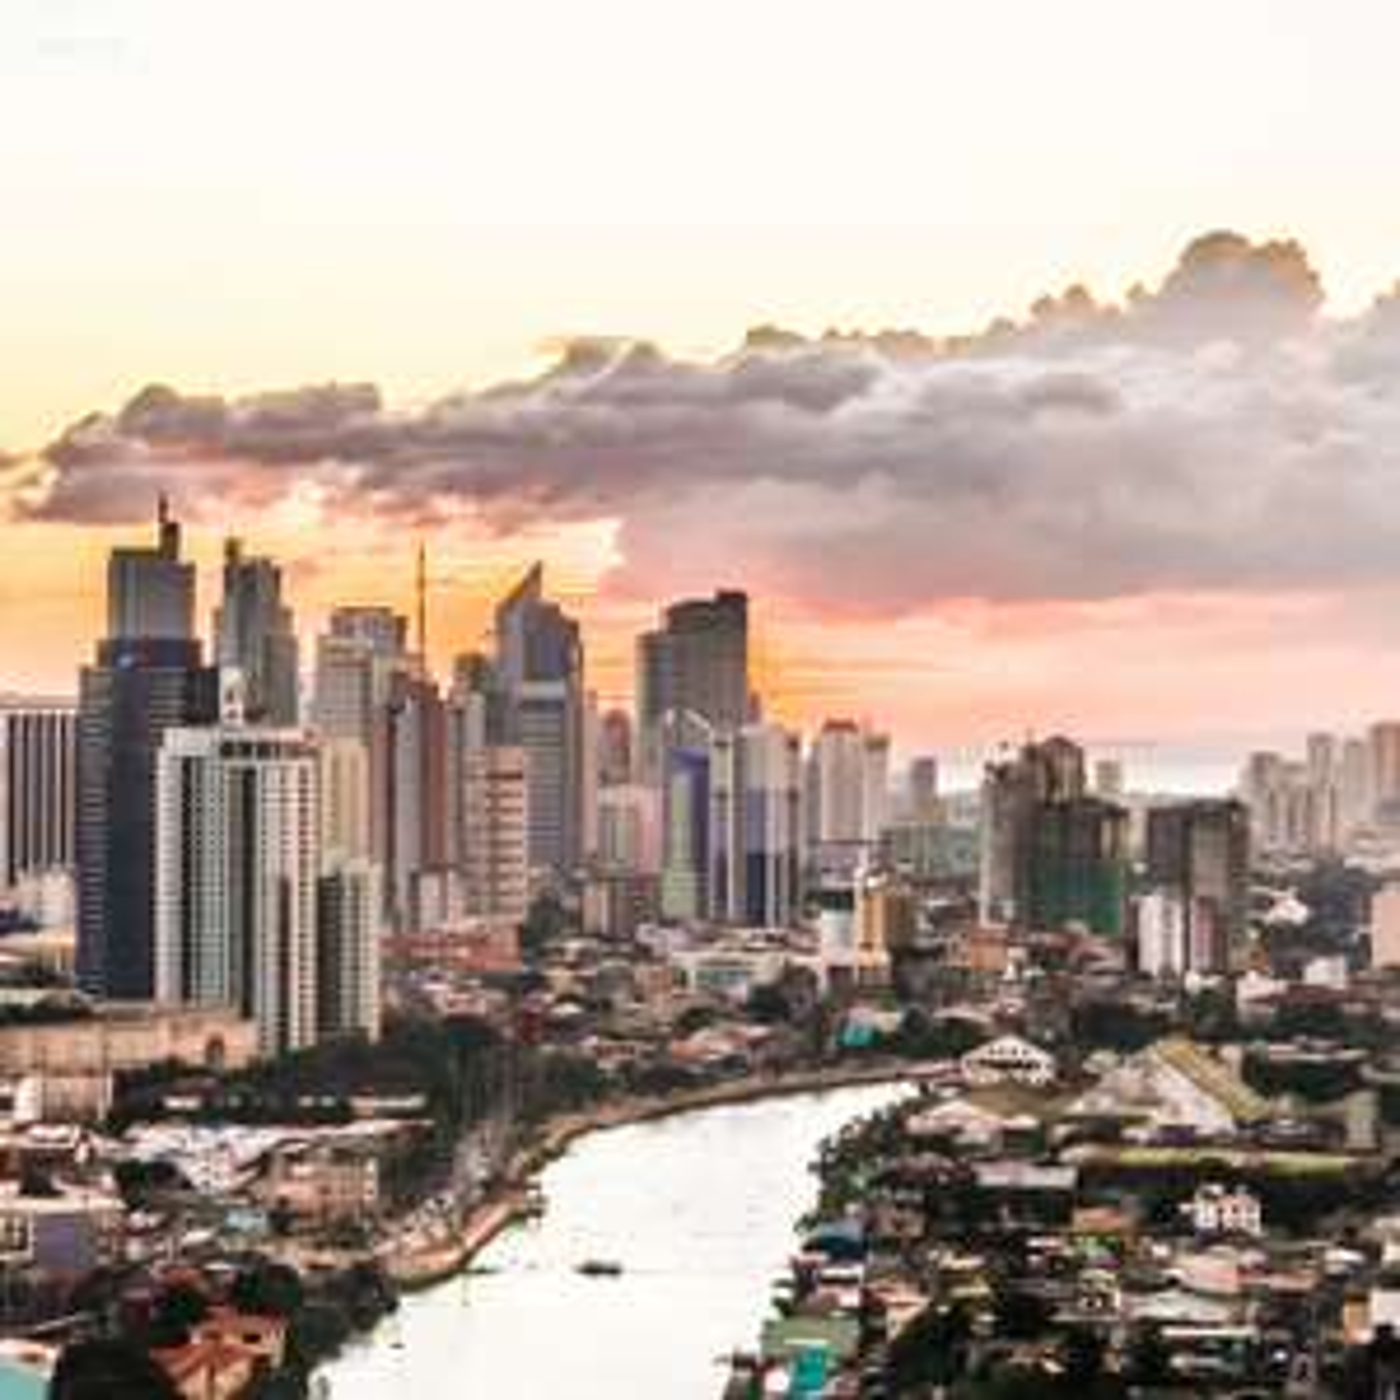 Vliegtickets: Amsterdam naar Manila (Filippijnen) incl. bagage voor €326 @ China Southern